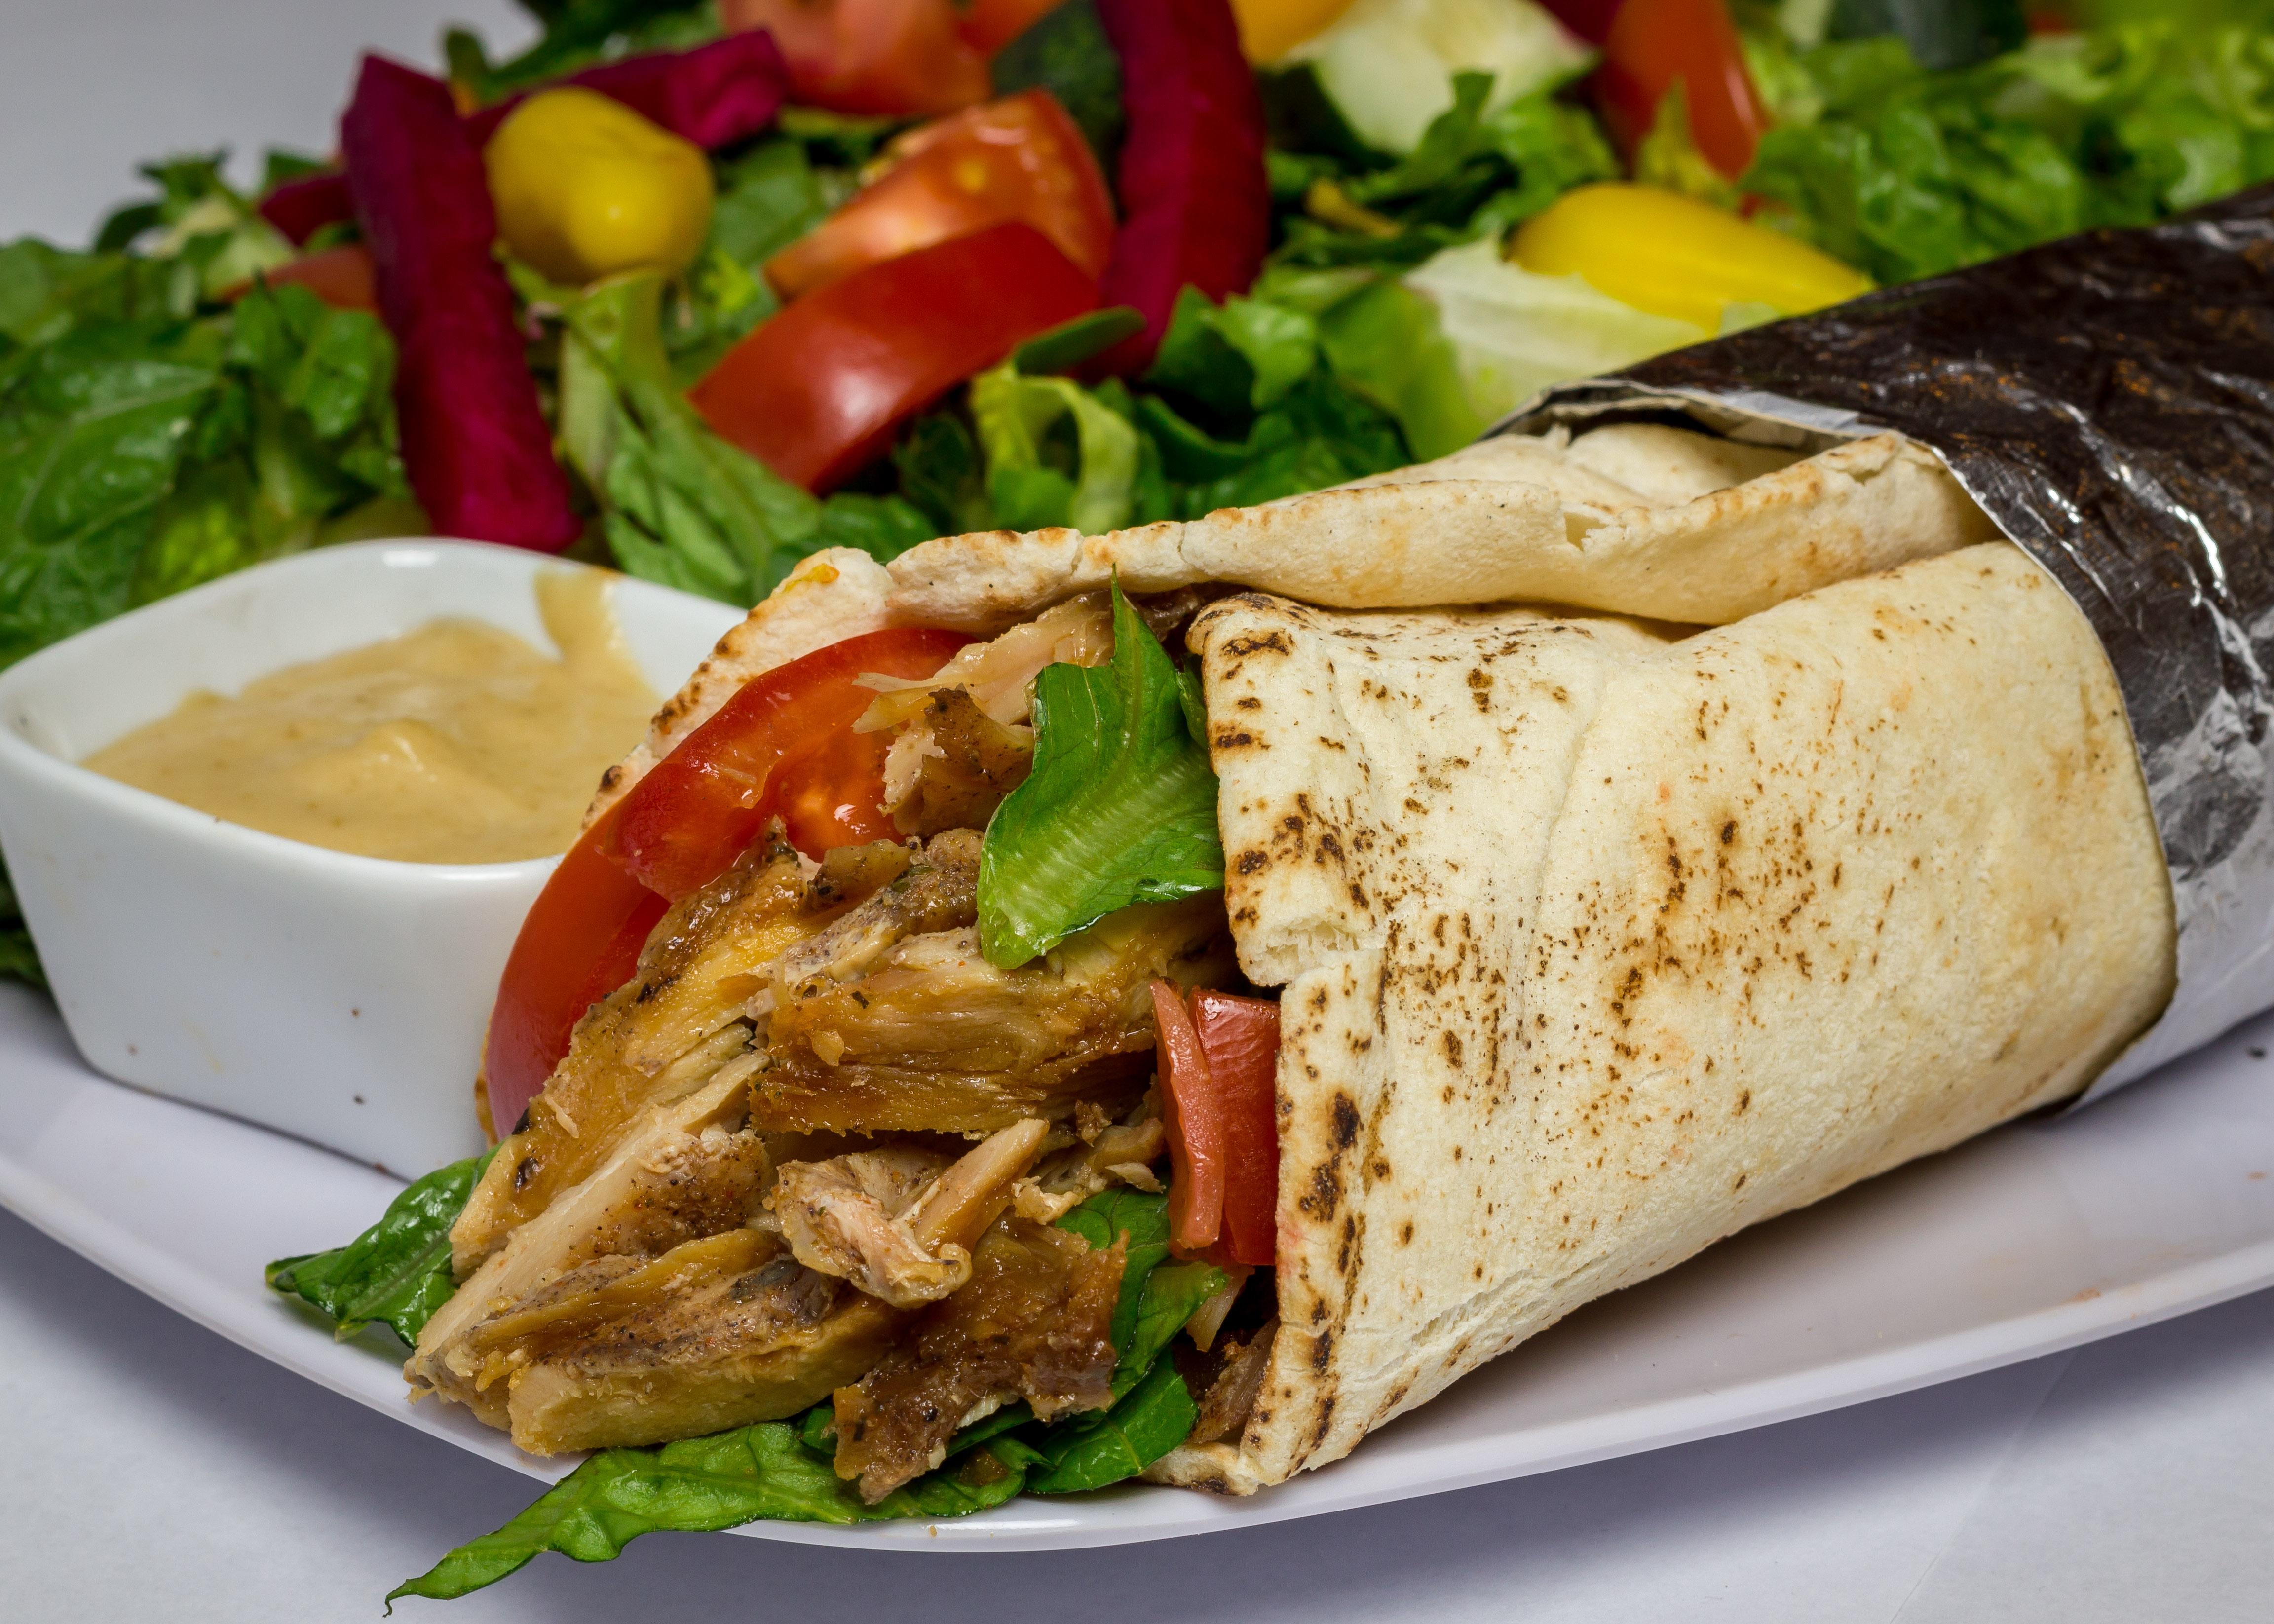 22) Chicken Shawarma Wrap